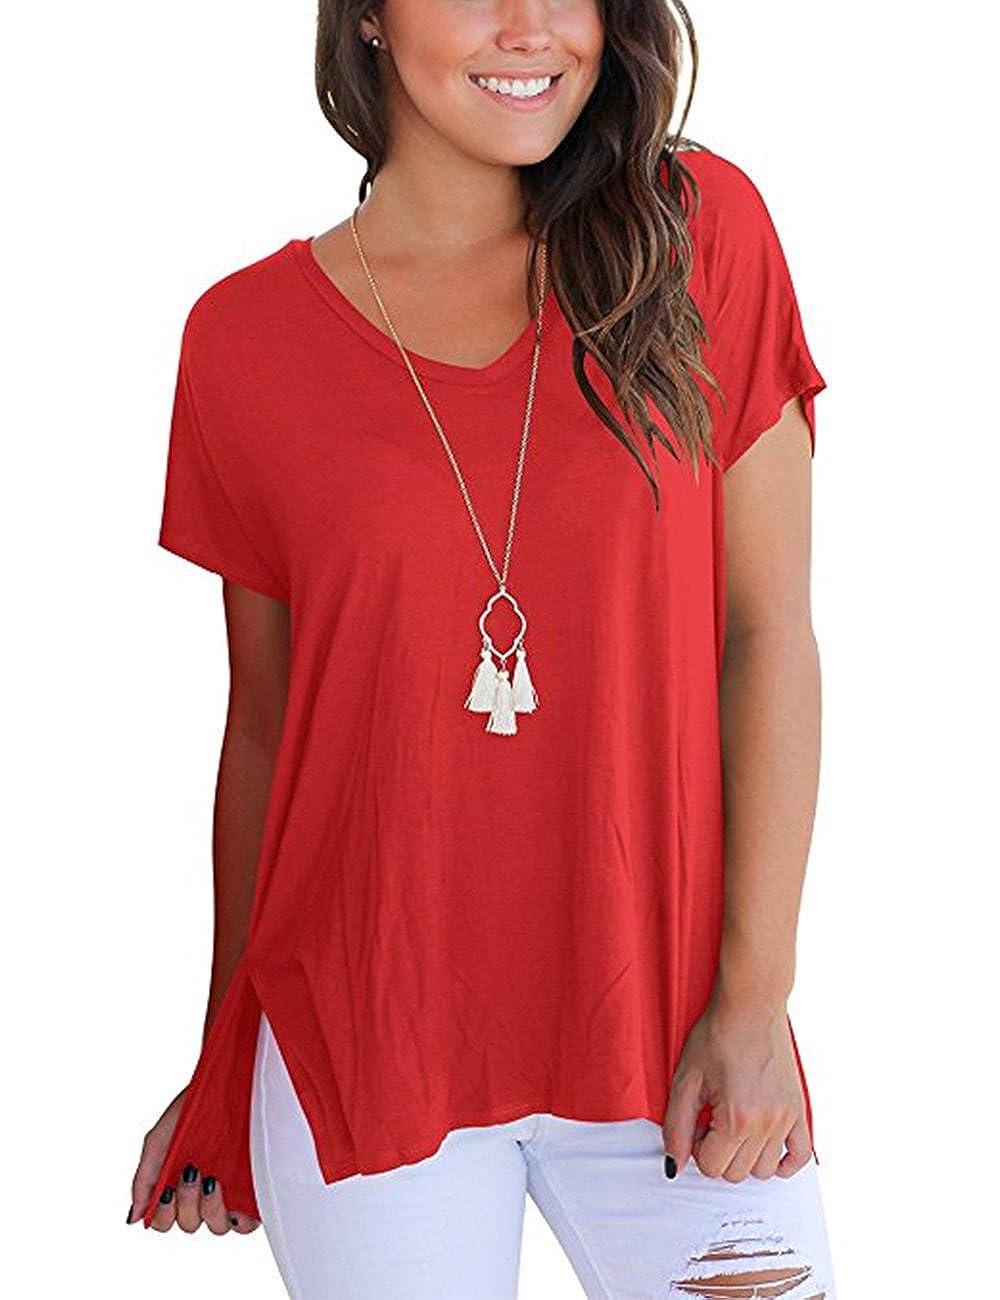 Yonala Women's Short Sleeve T Shirt Basic Tee Tops Plain Casual Tees Shirt